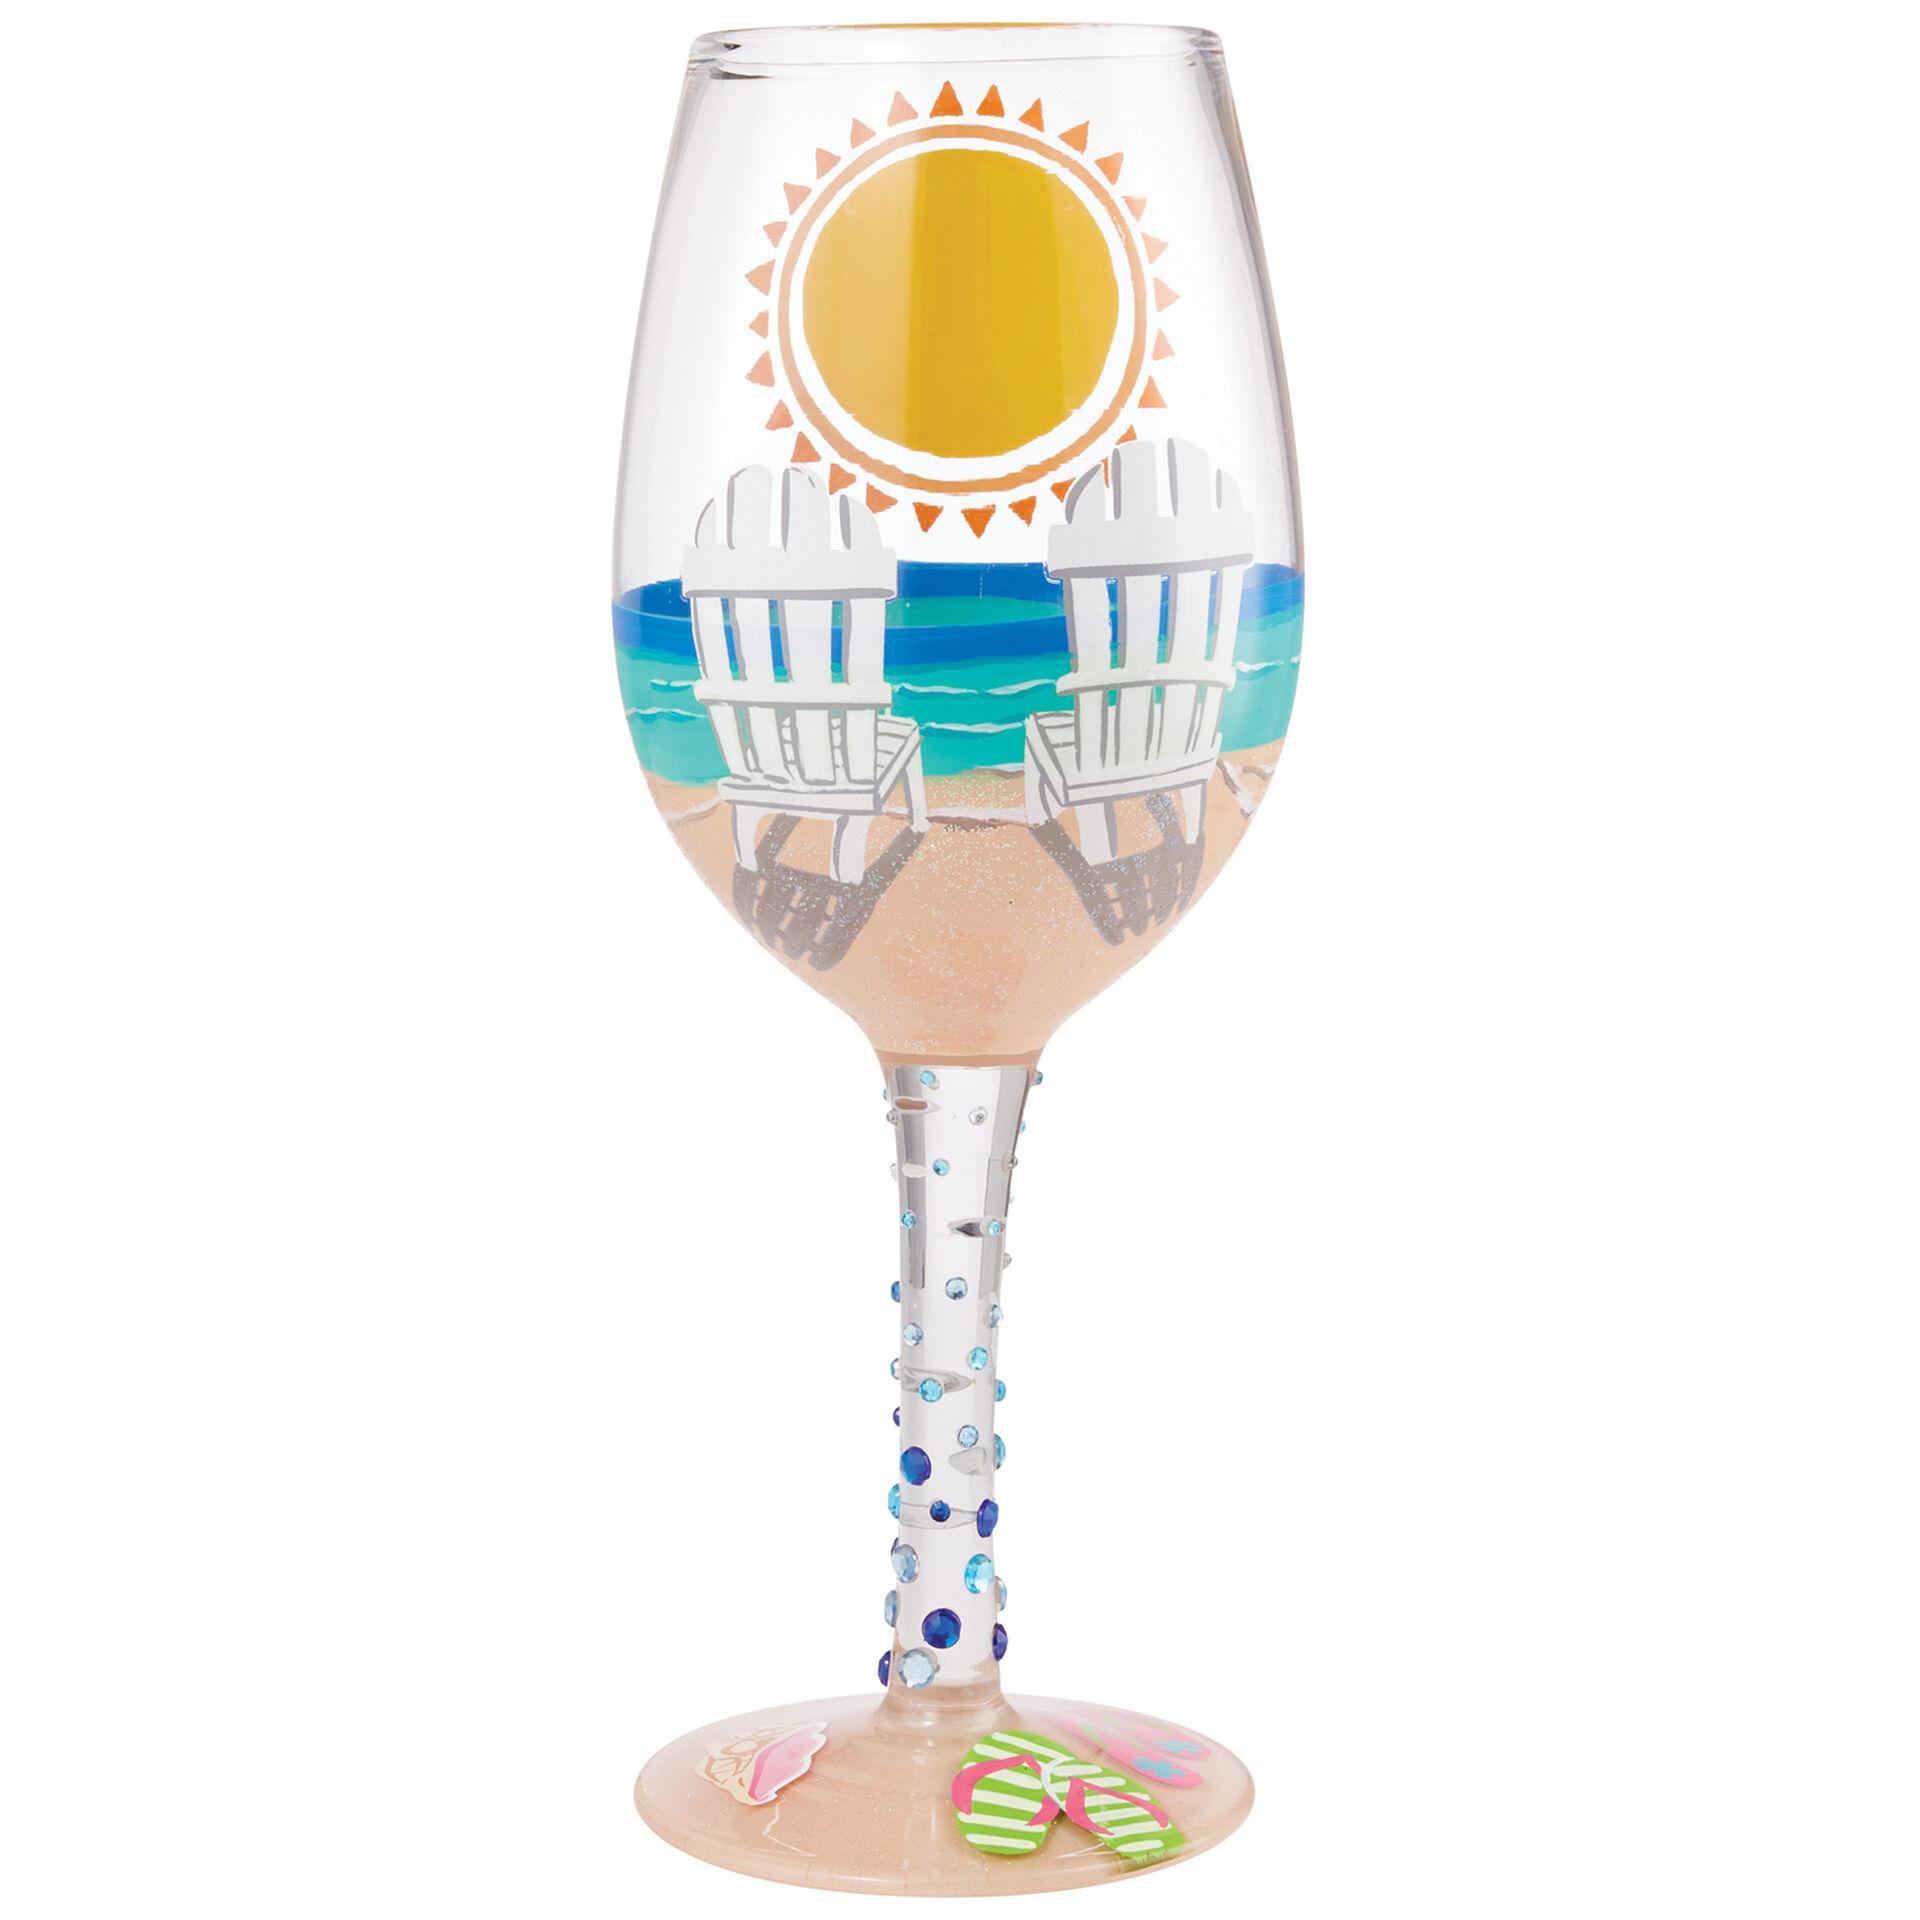 Lolita Sun On The Beach Handpainted Wine Glass 15 Oz Wine Glasses Wine Tumblers Hallmark